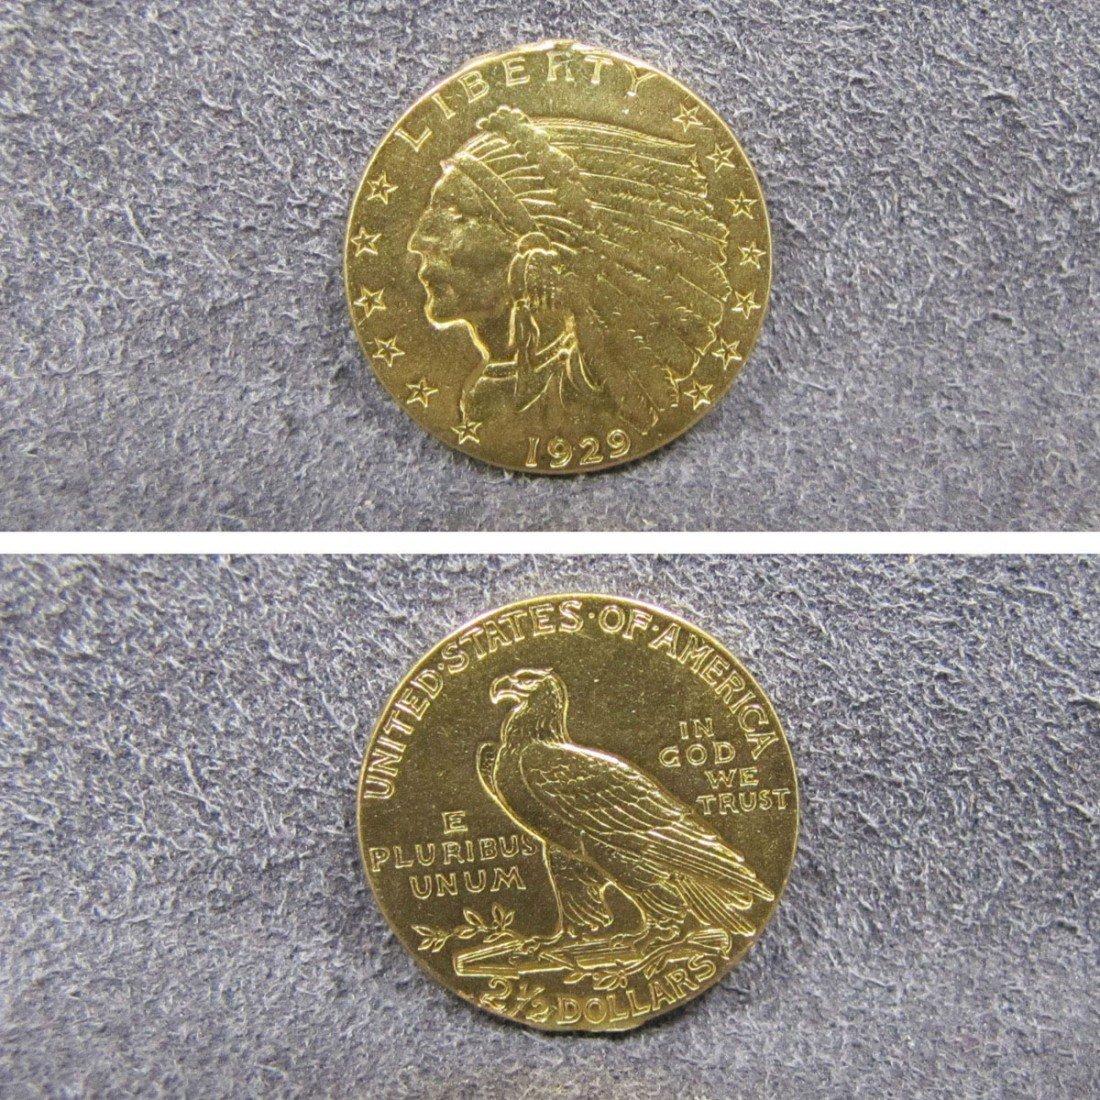 18: 1929 U.S. INDIAN HEAD GOLD QUARTER EAGLE COIN